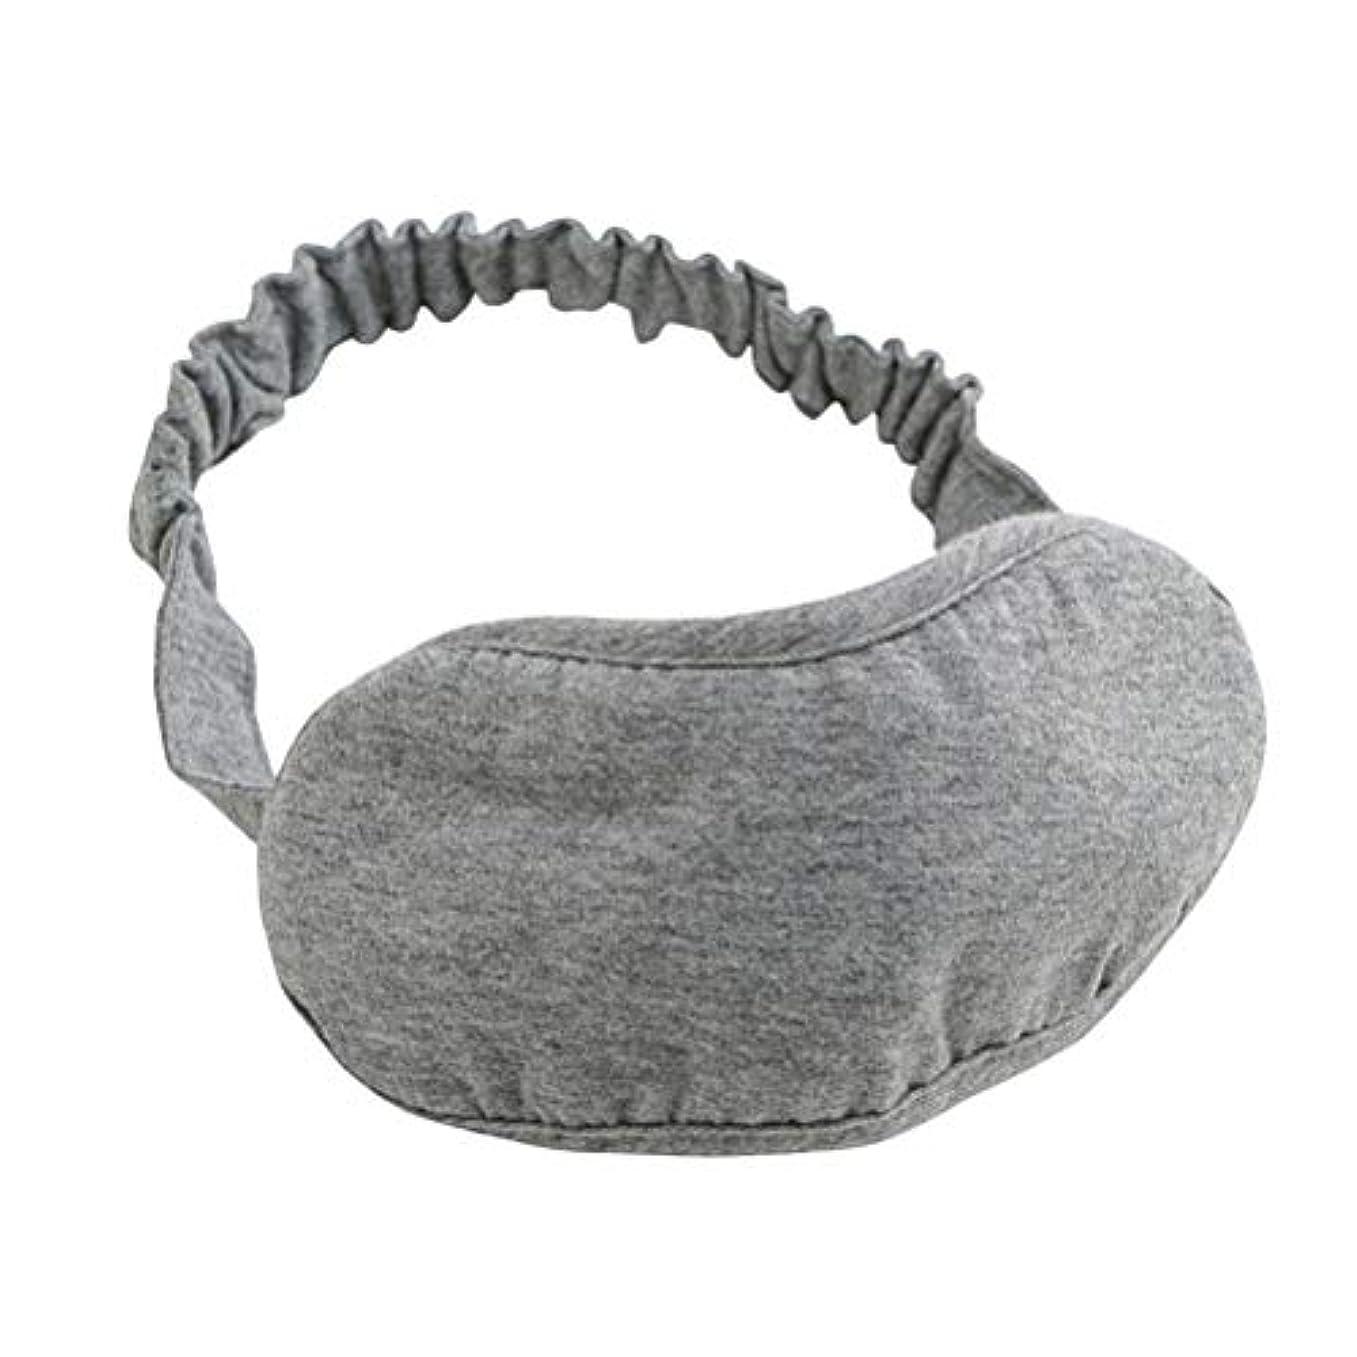 Healifty アイマスク アイパッチ コットン 厚い ナップアイシェードカバースリーピング?ブラインドフォールズ旅行オフィス(グレー)